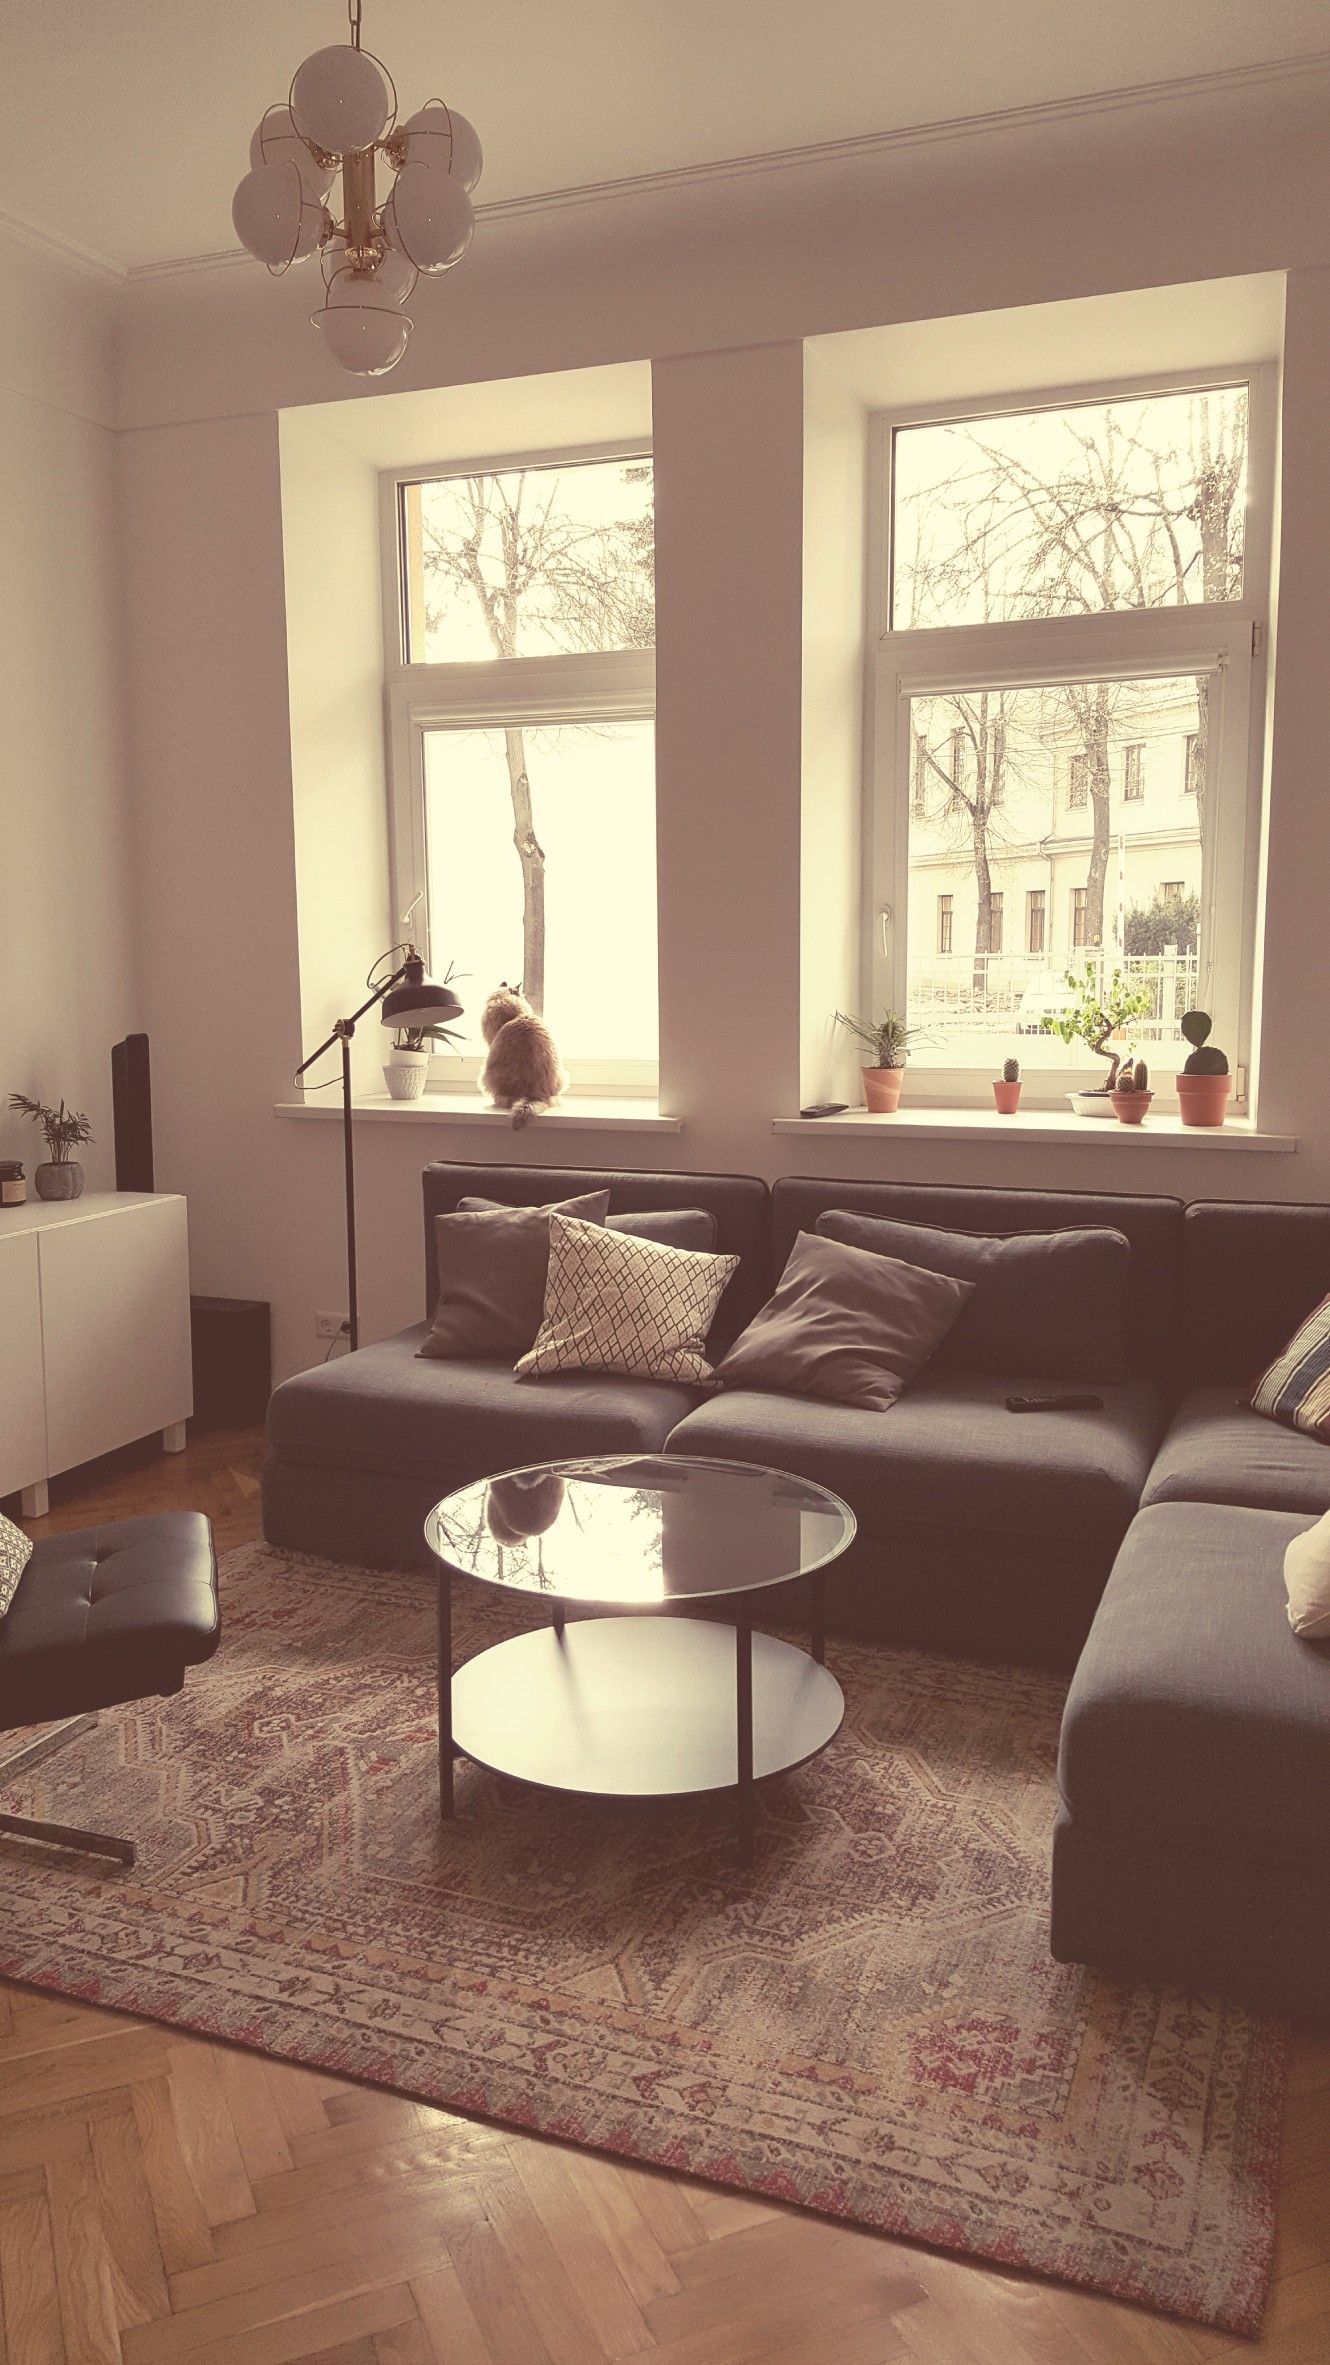 Valentuna ikea Valentuna ikea living room